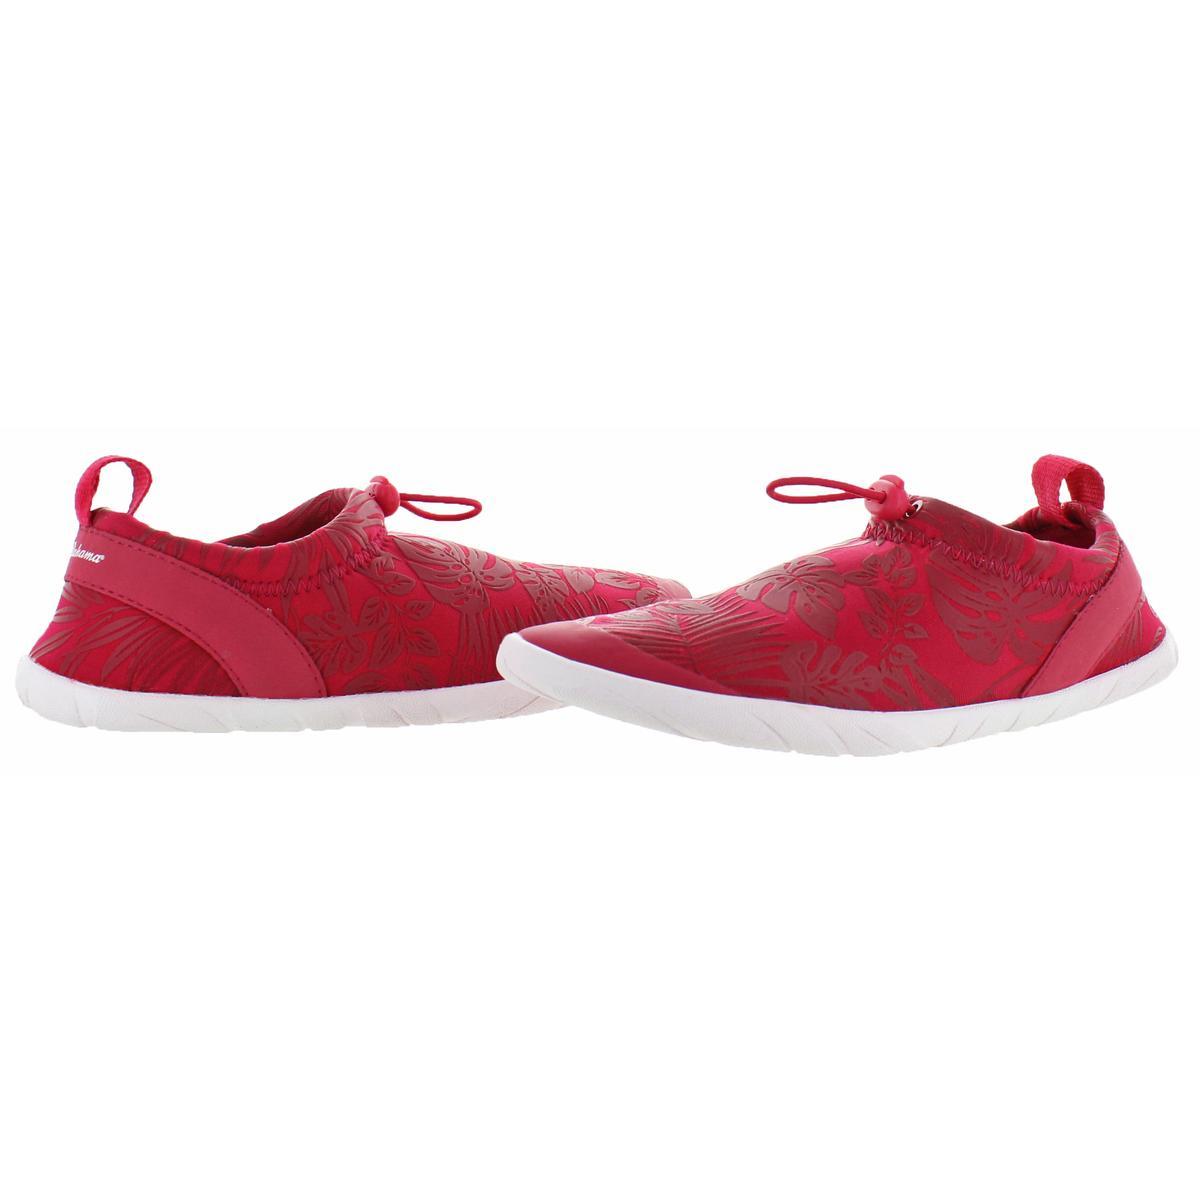 ae19a20ac6f03 Tommy Bahama Women's Komomo Island Water Shoe Pink 10 M US